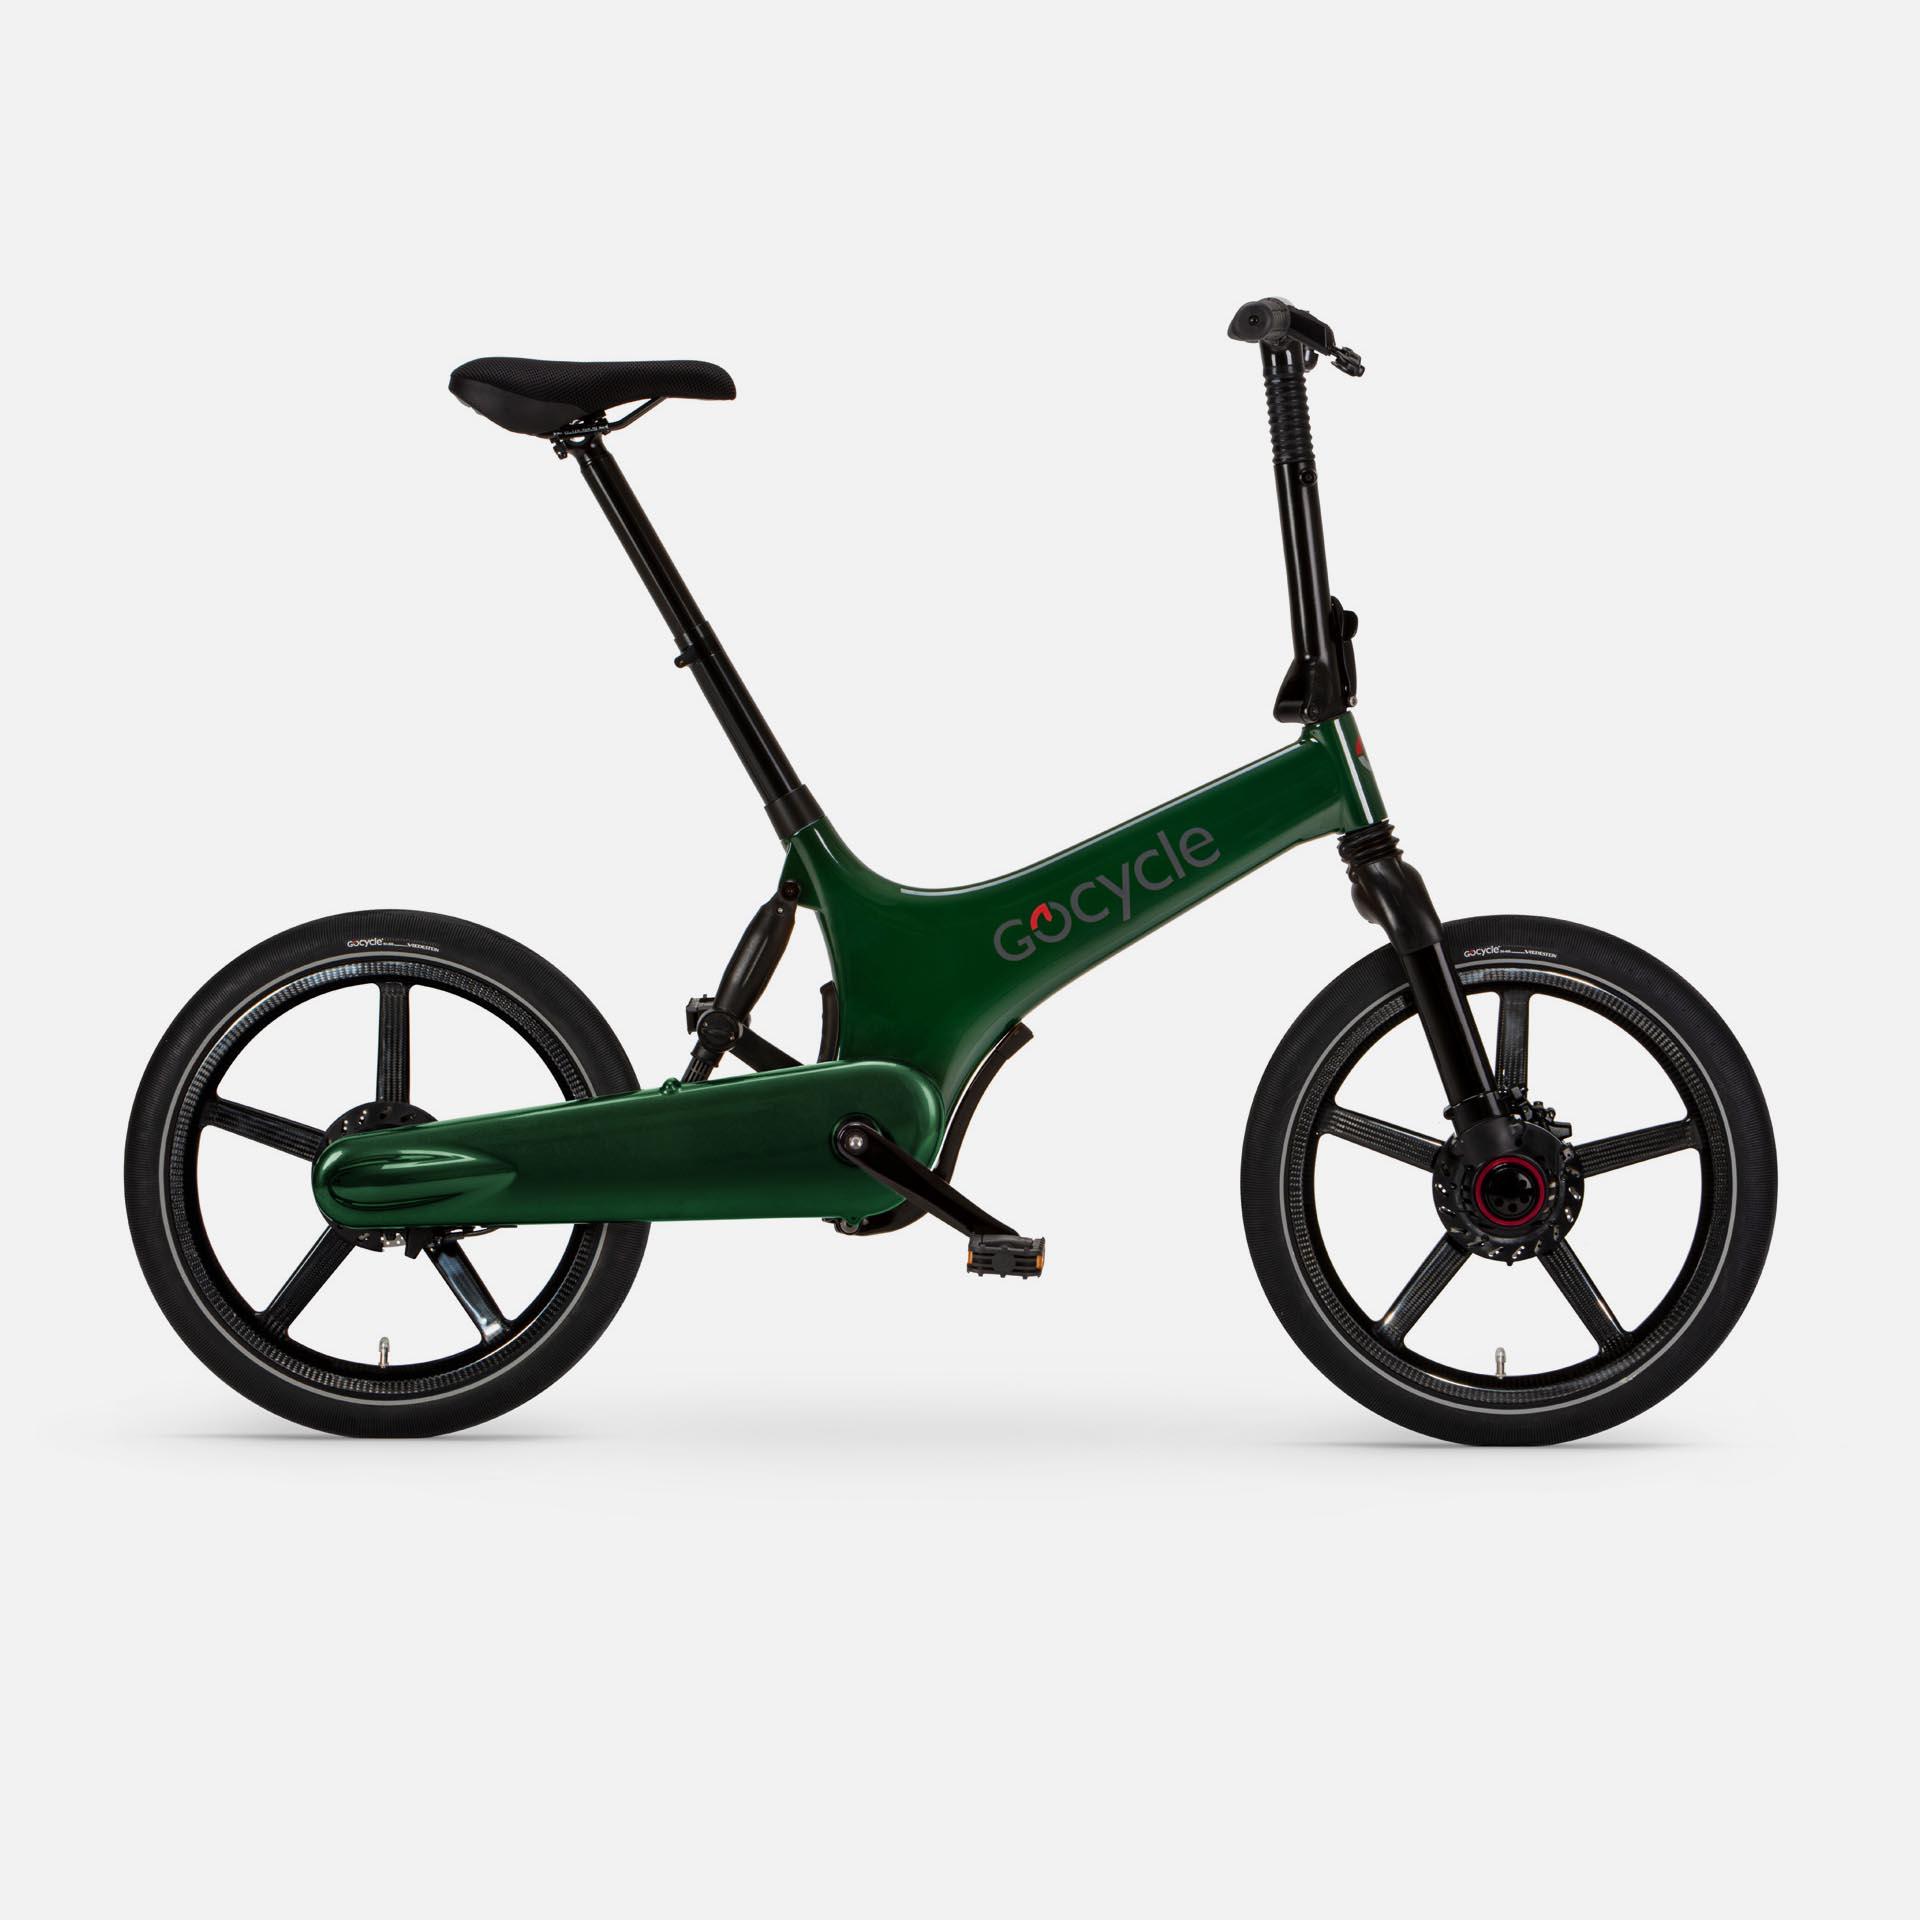 Gocycle G3+ Green (Front Brake Left)